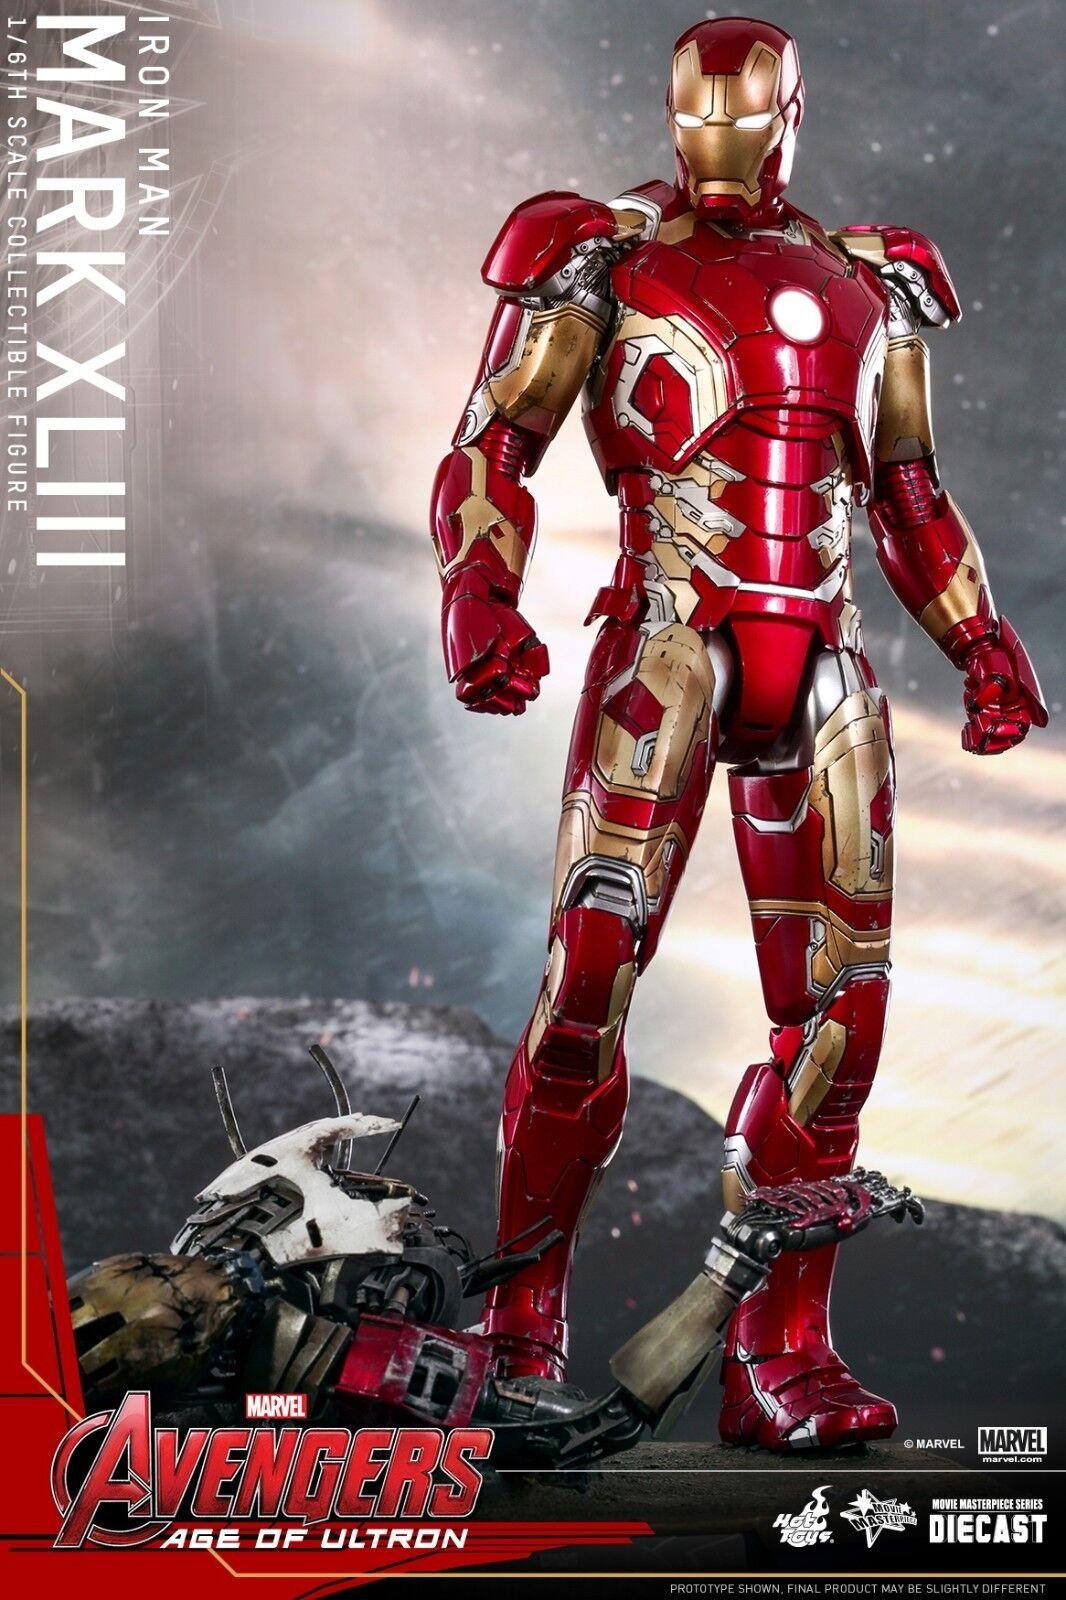 heta leksaker Avengers 2 Age of Ultron Iron Man Marke Xliii 43 1  6 Figur I Lager